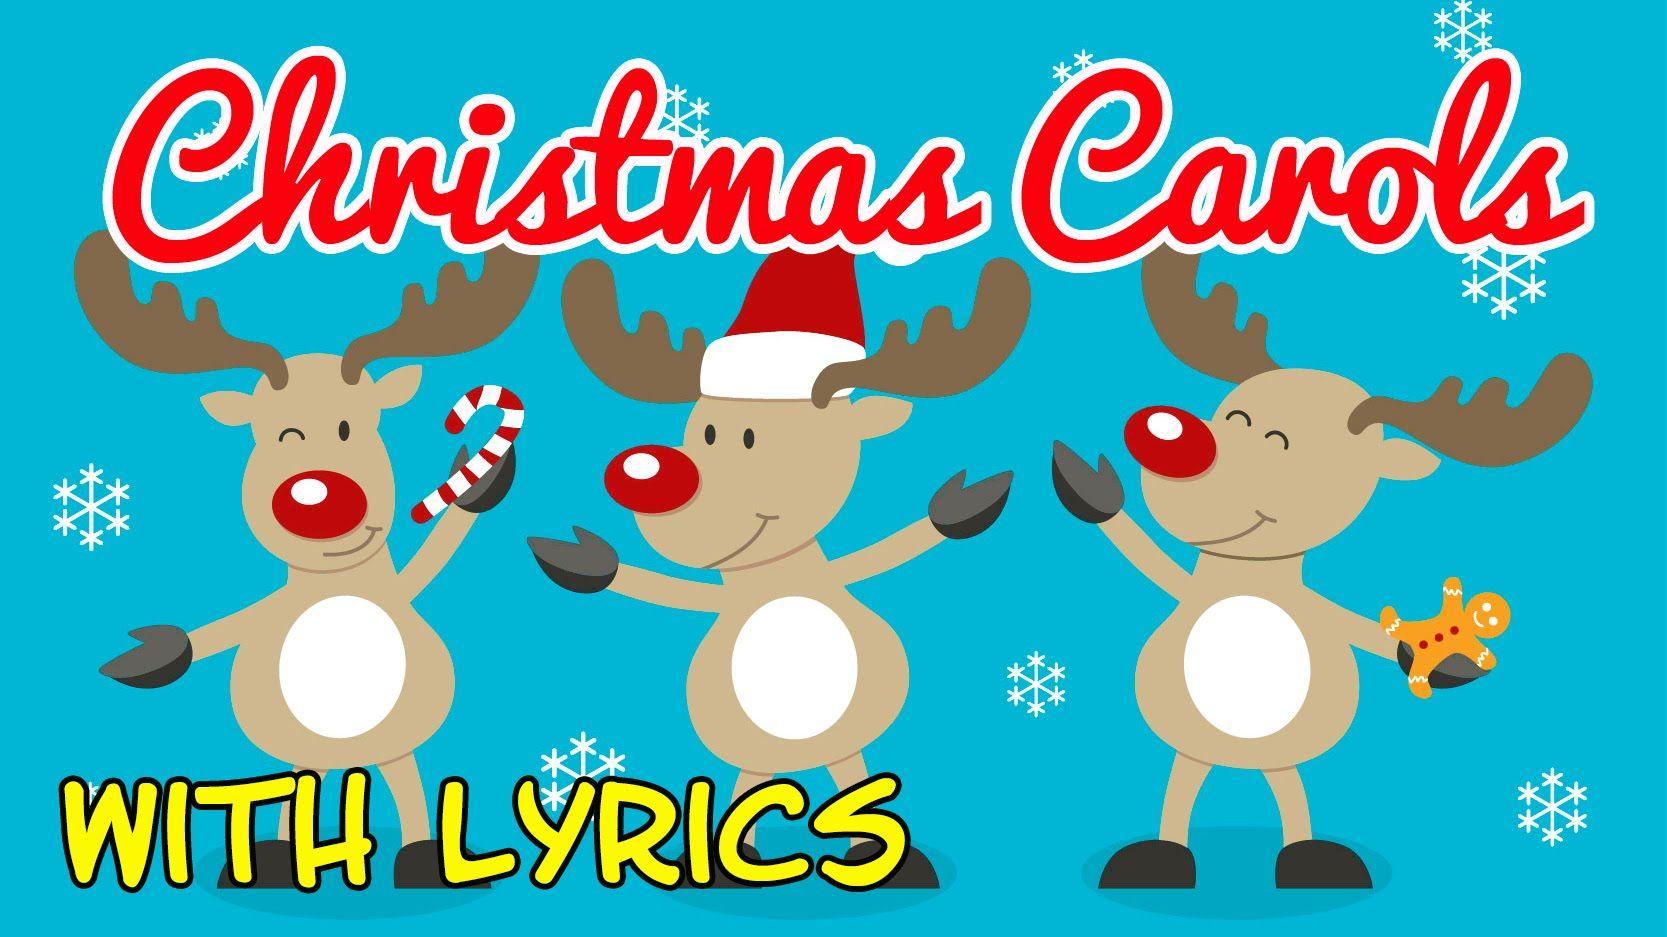 Christmas Carols for Children with Lyrics ♫ Christmas